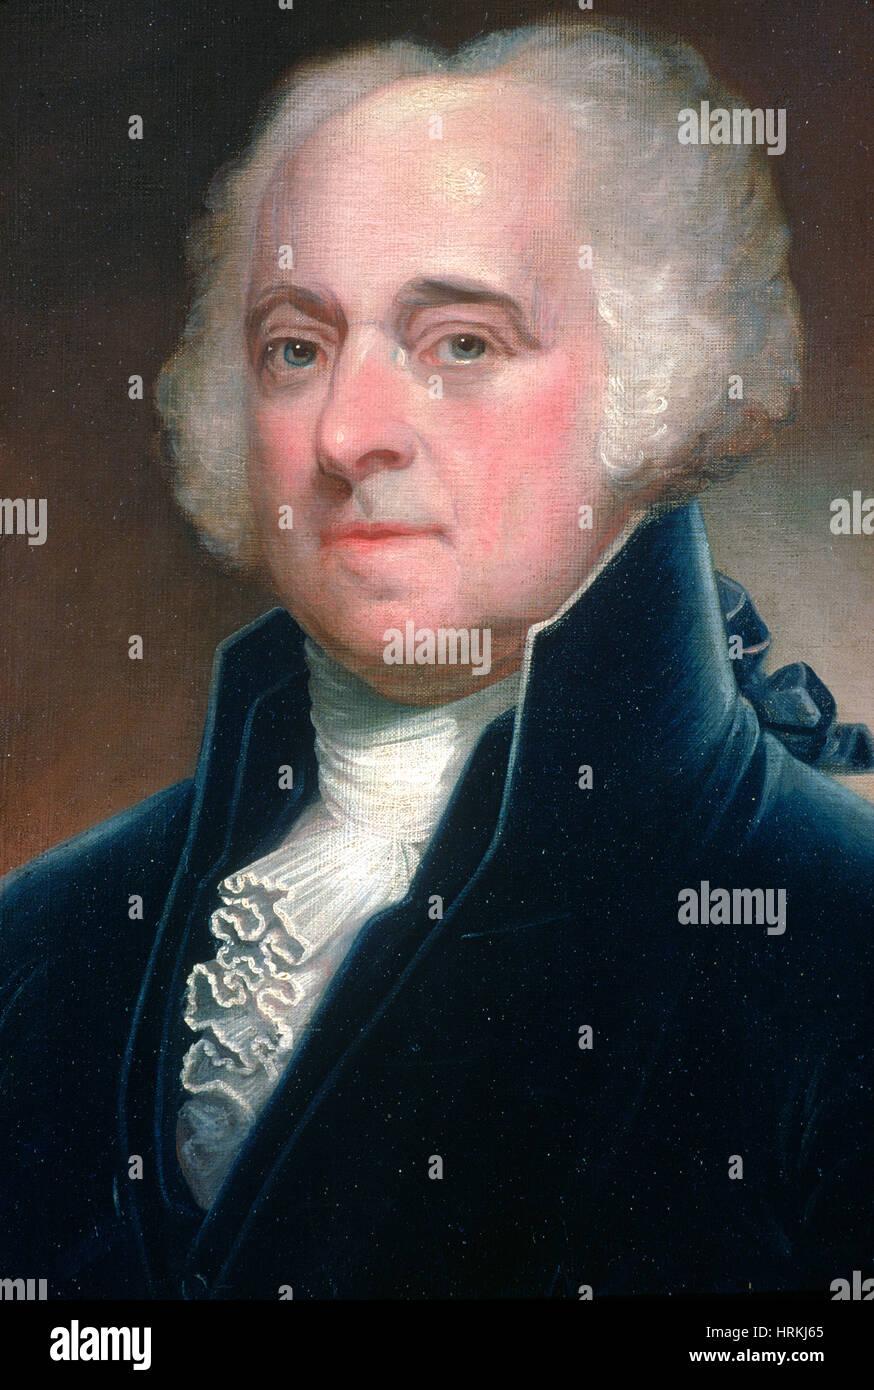 Art Oil painting America President John Adams on canvas